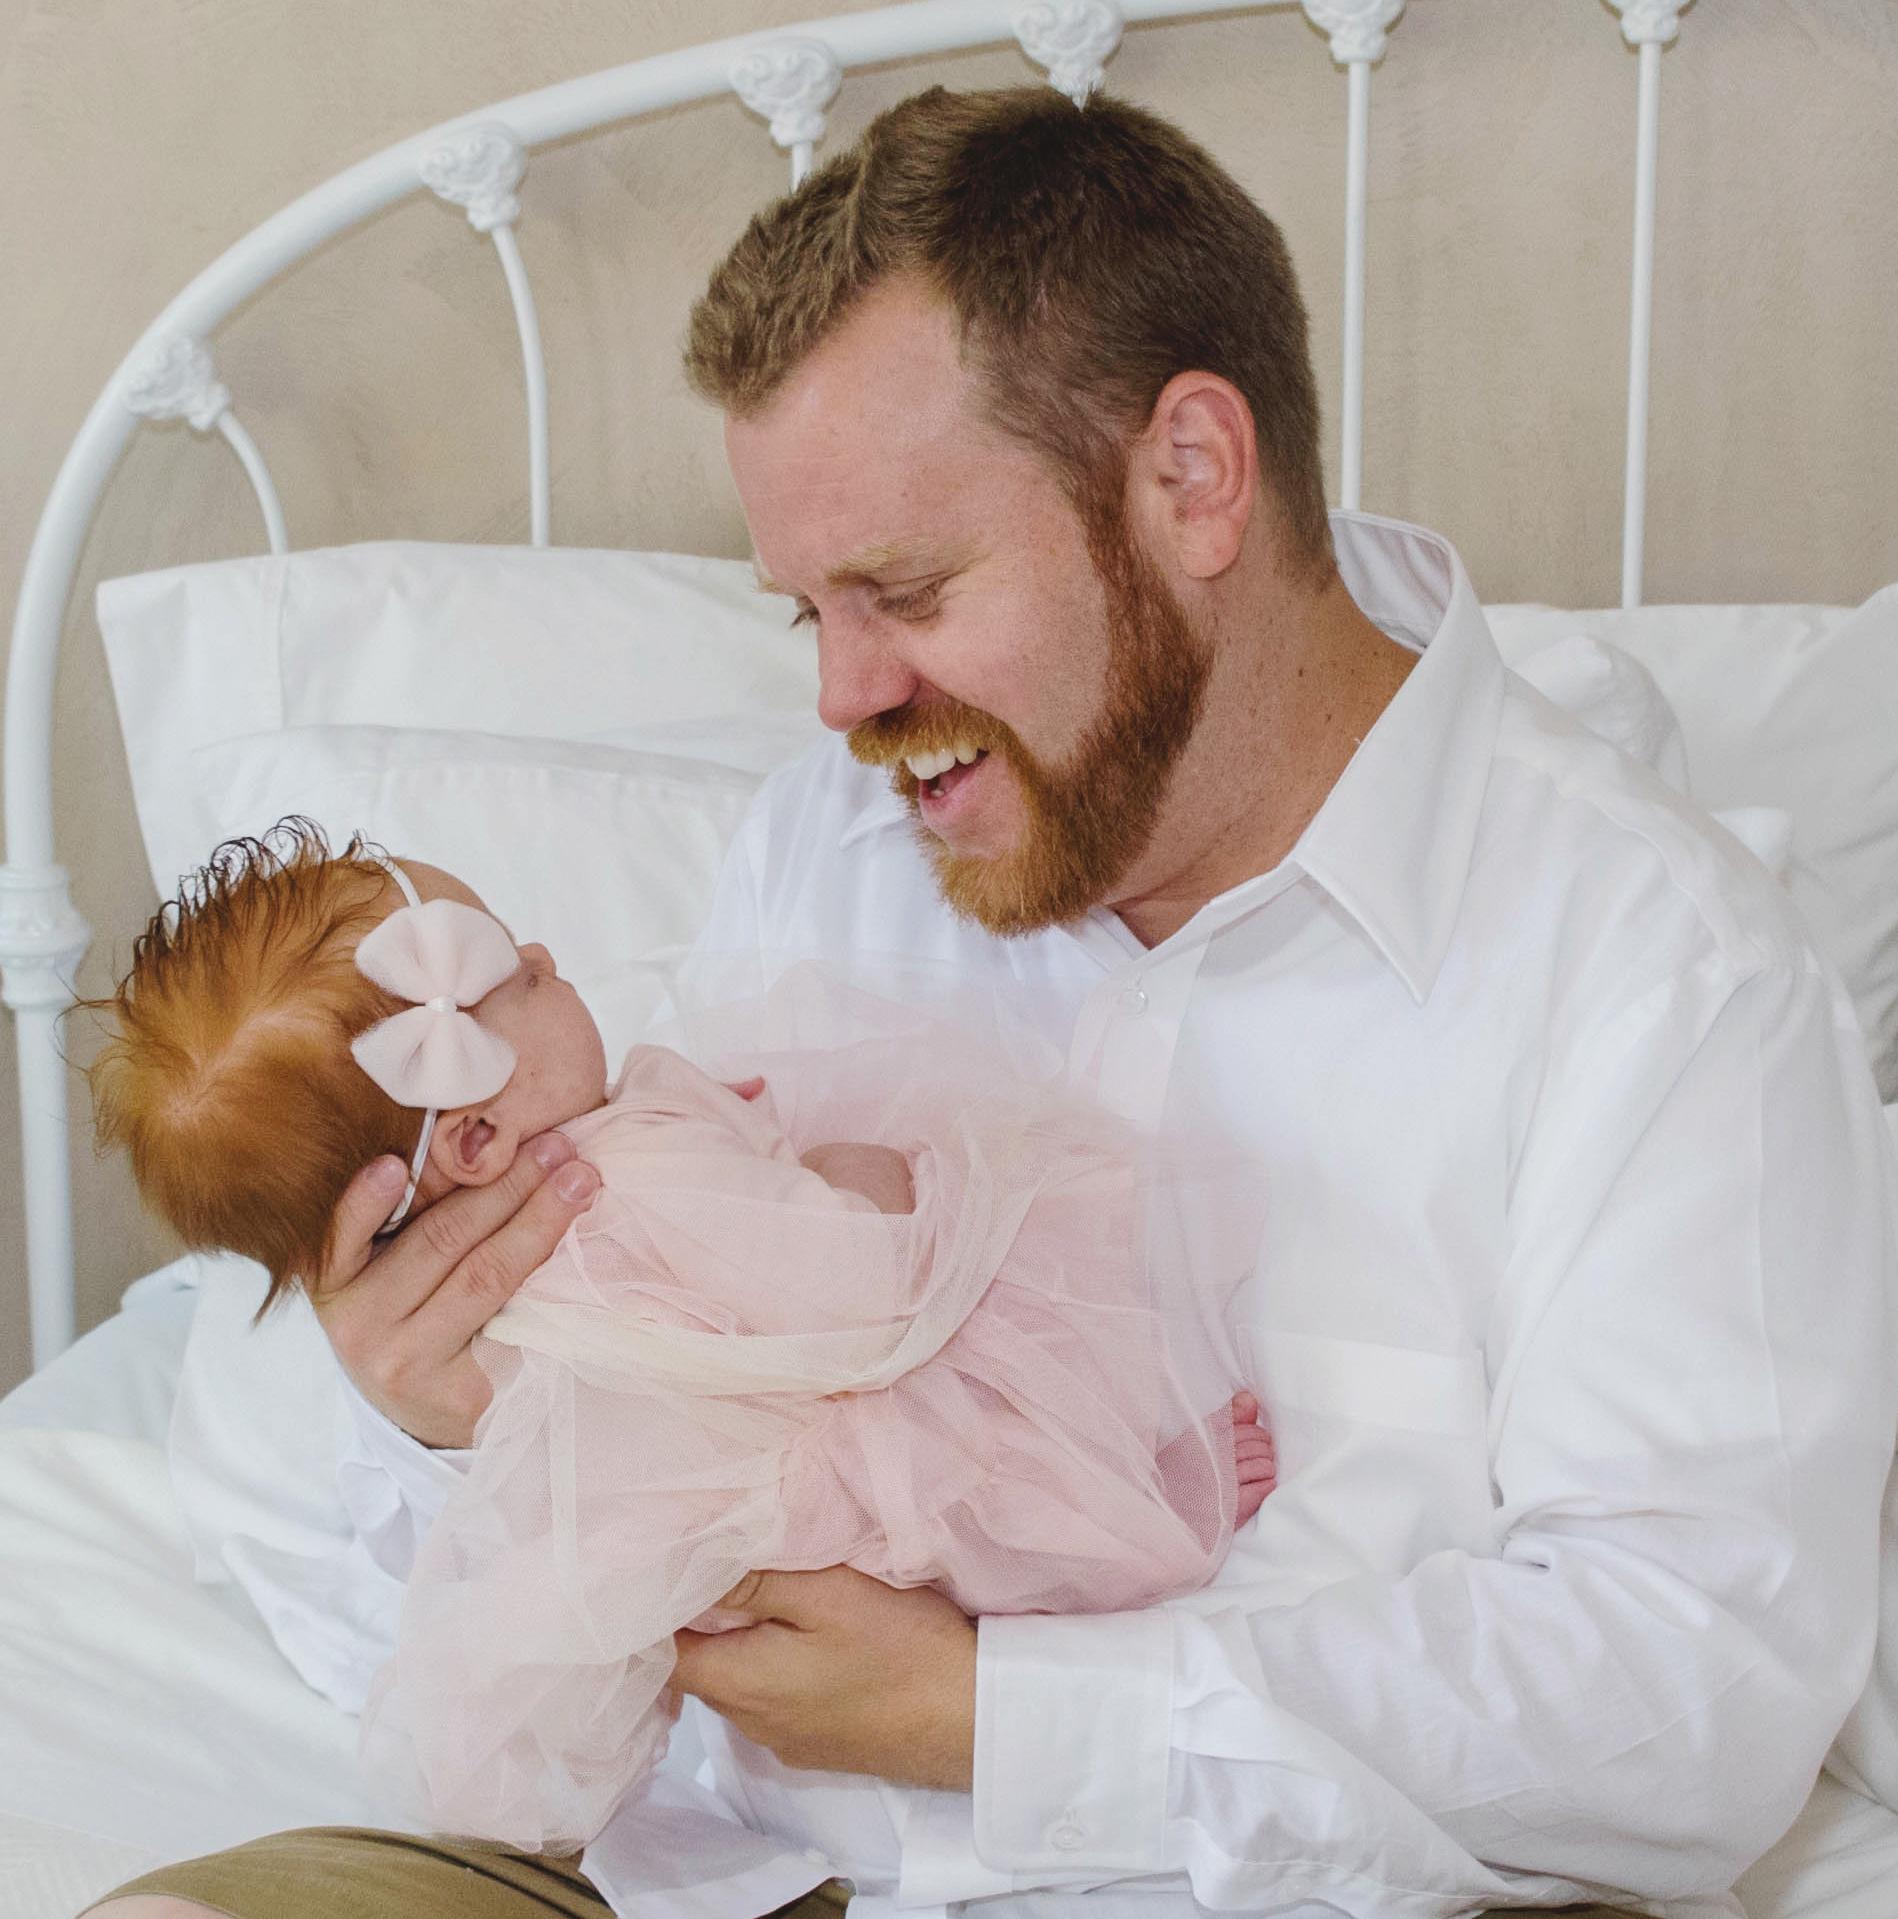 childbirth classes st george utah